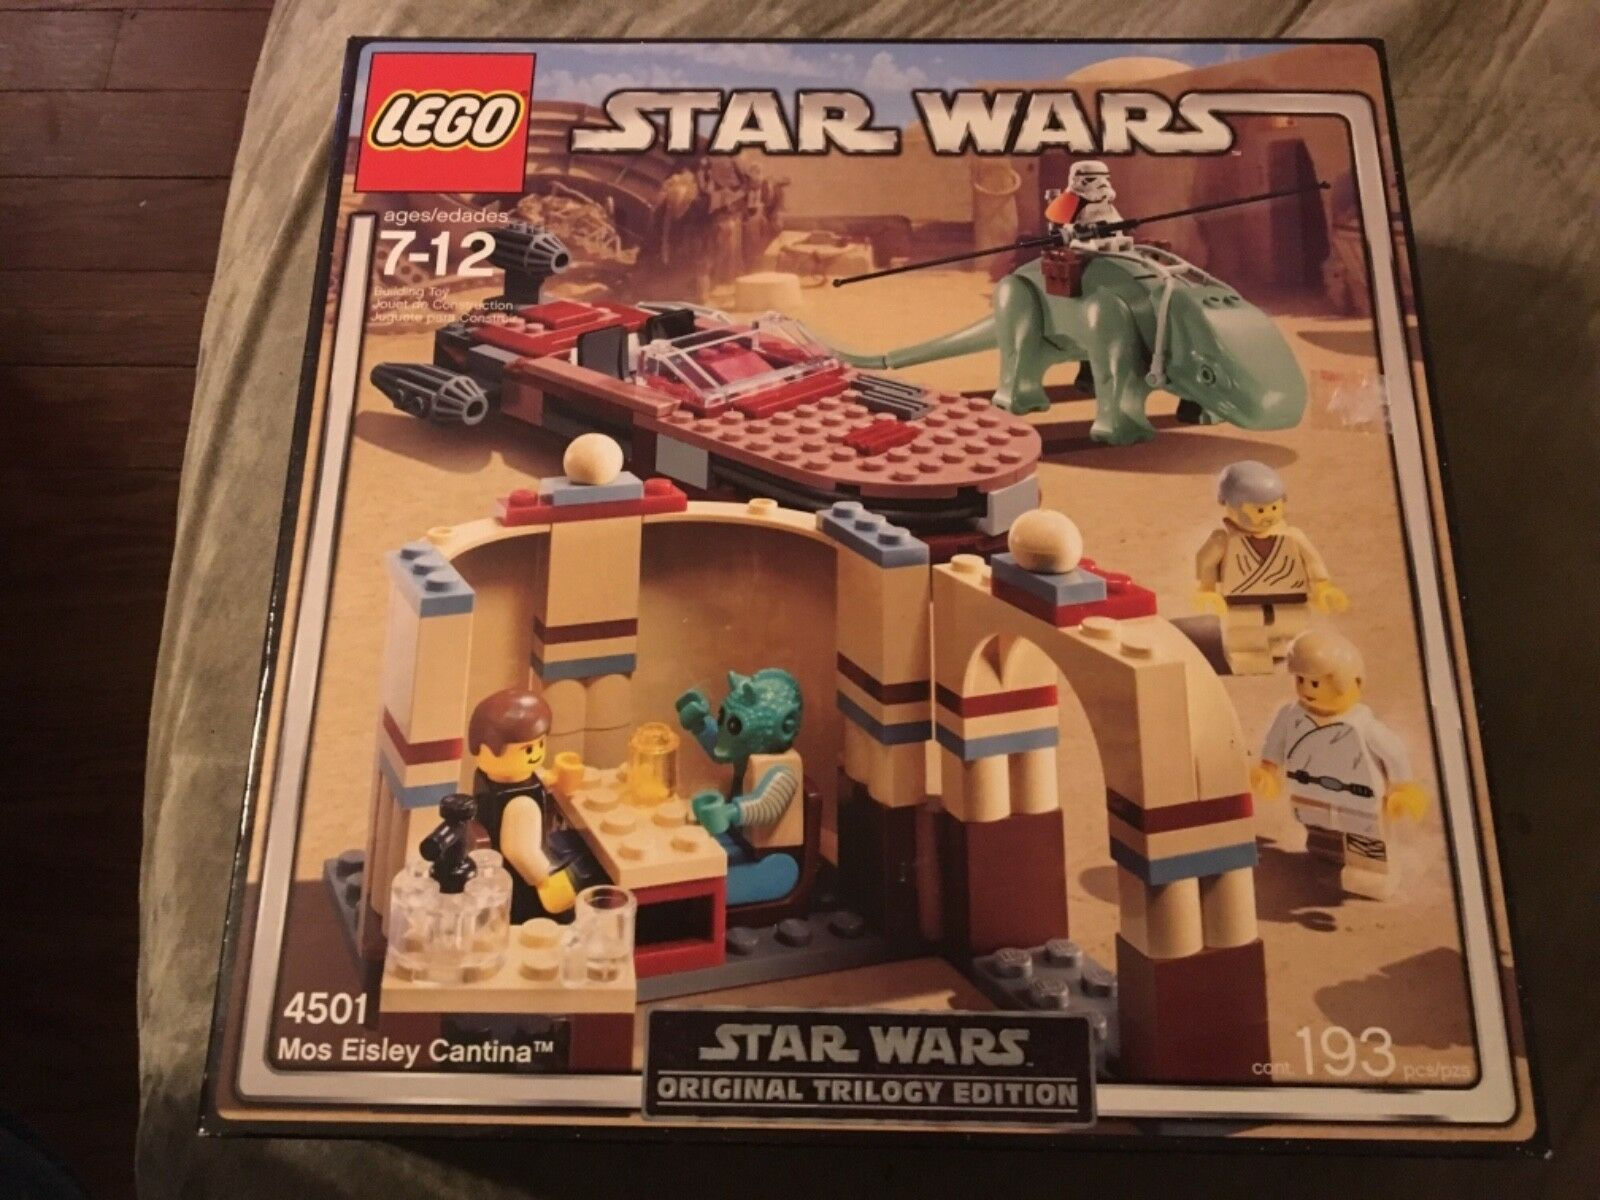 Star Wars LEGO set original trilogy  edition 4501 mos risqué Cantina  livraison gratuite!